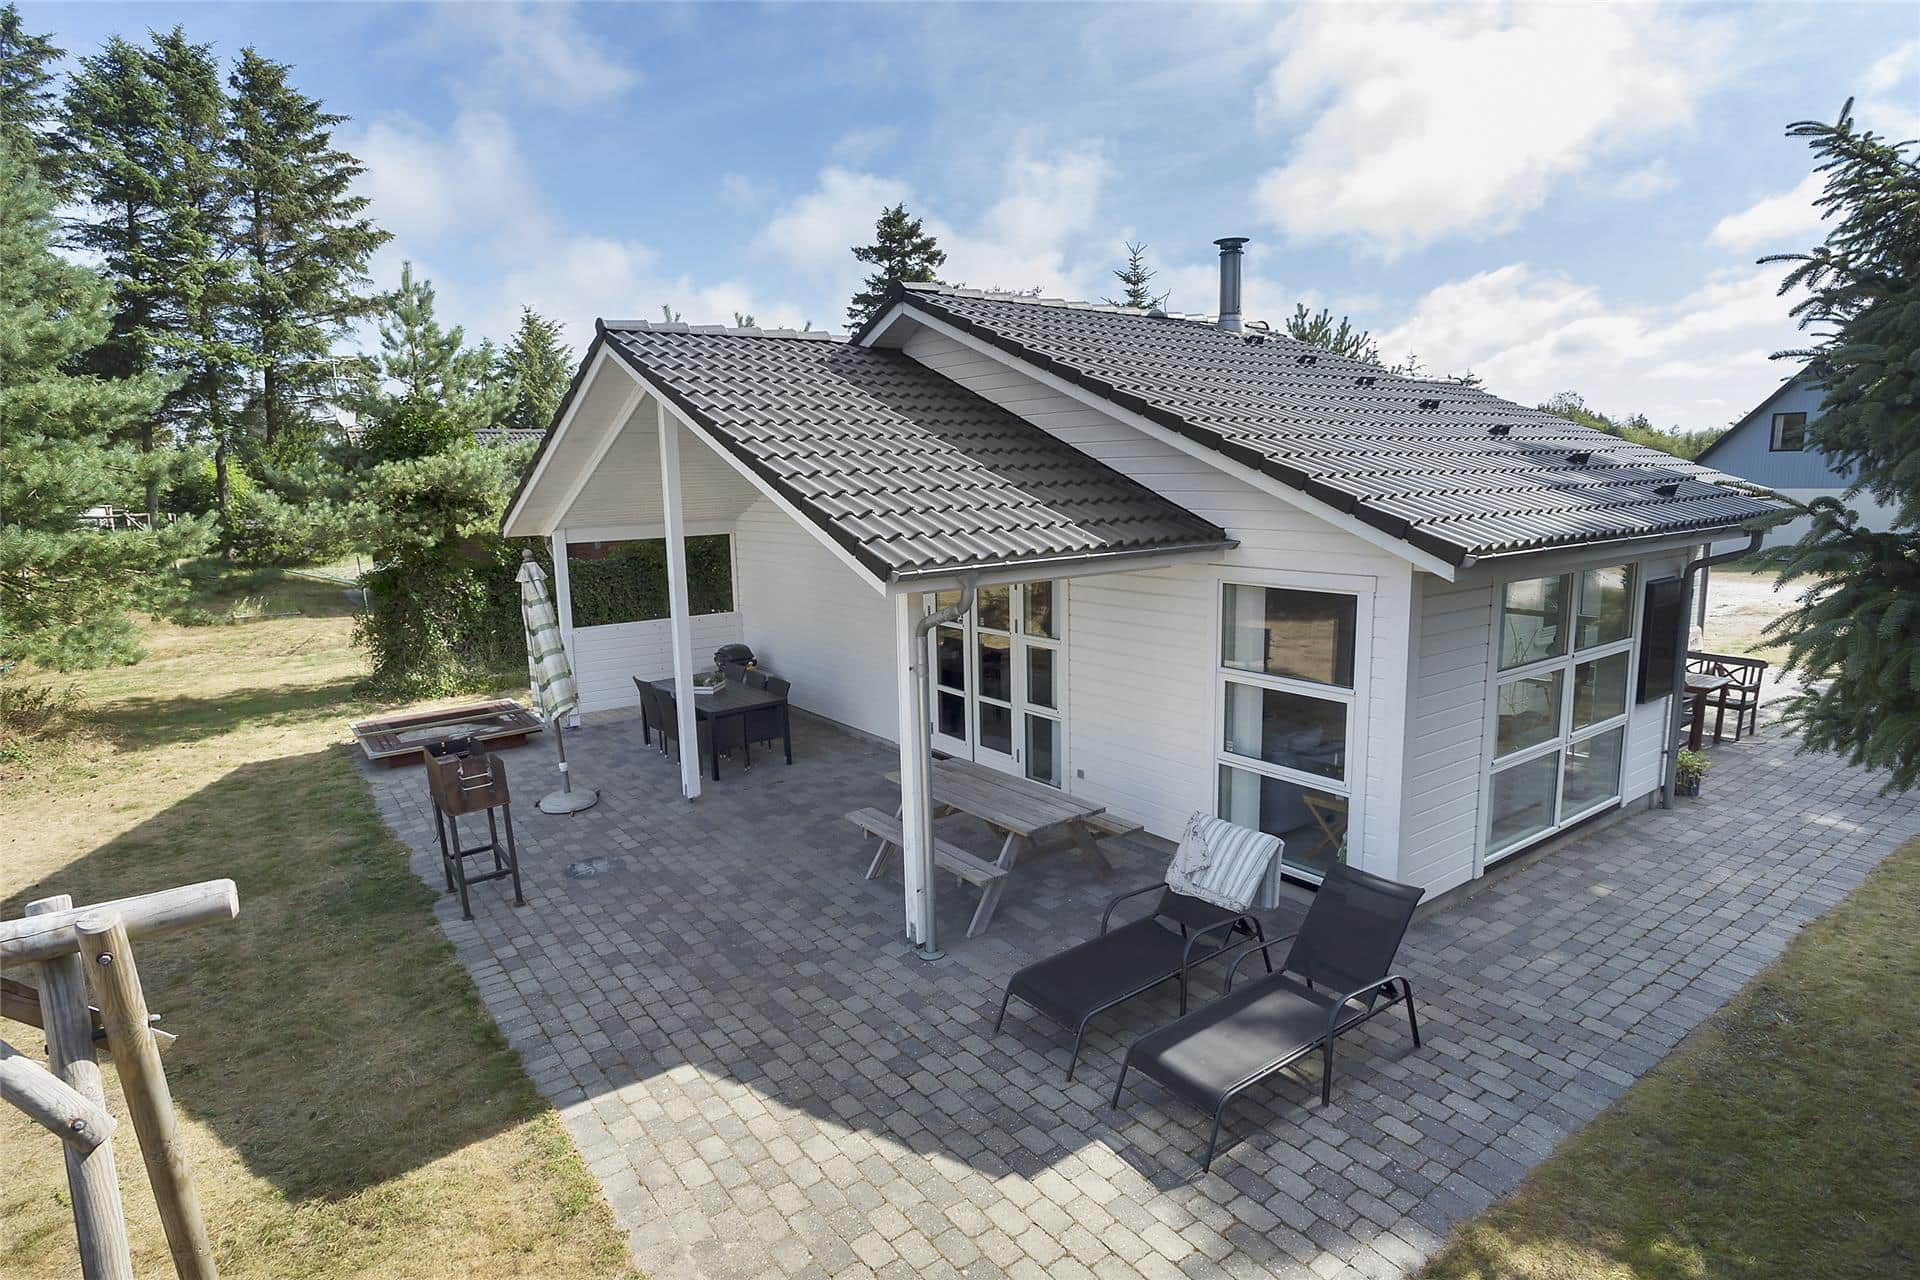 Bild 1-13 Ferienhaus 879, Pighvarvej 3, DK - 7700 Thisted